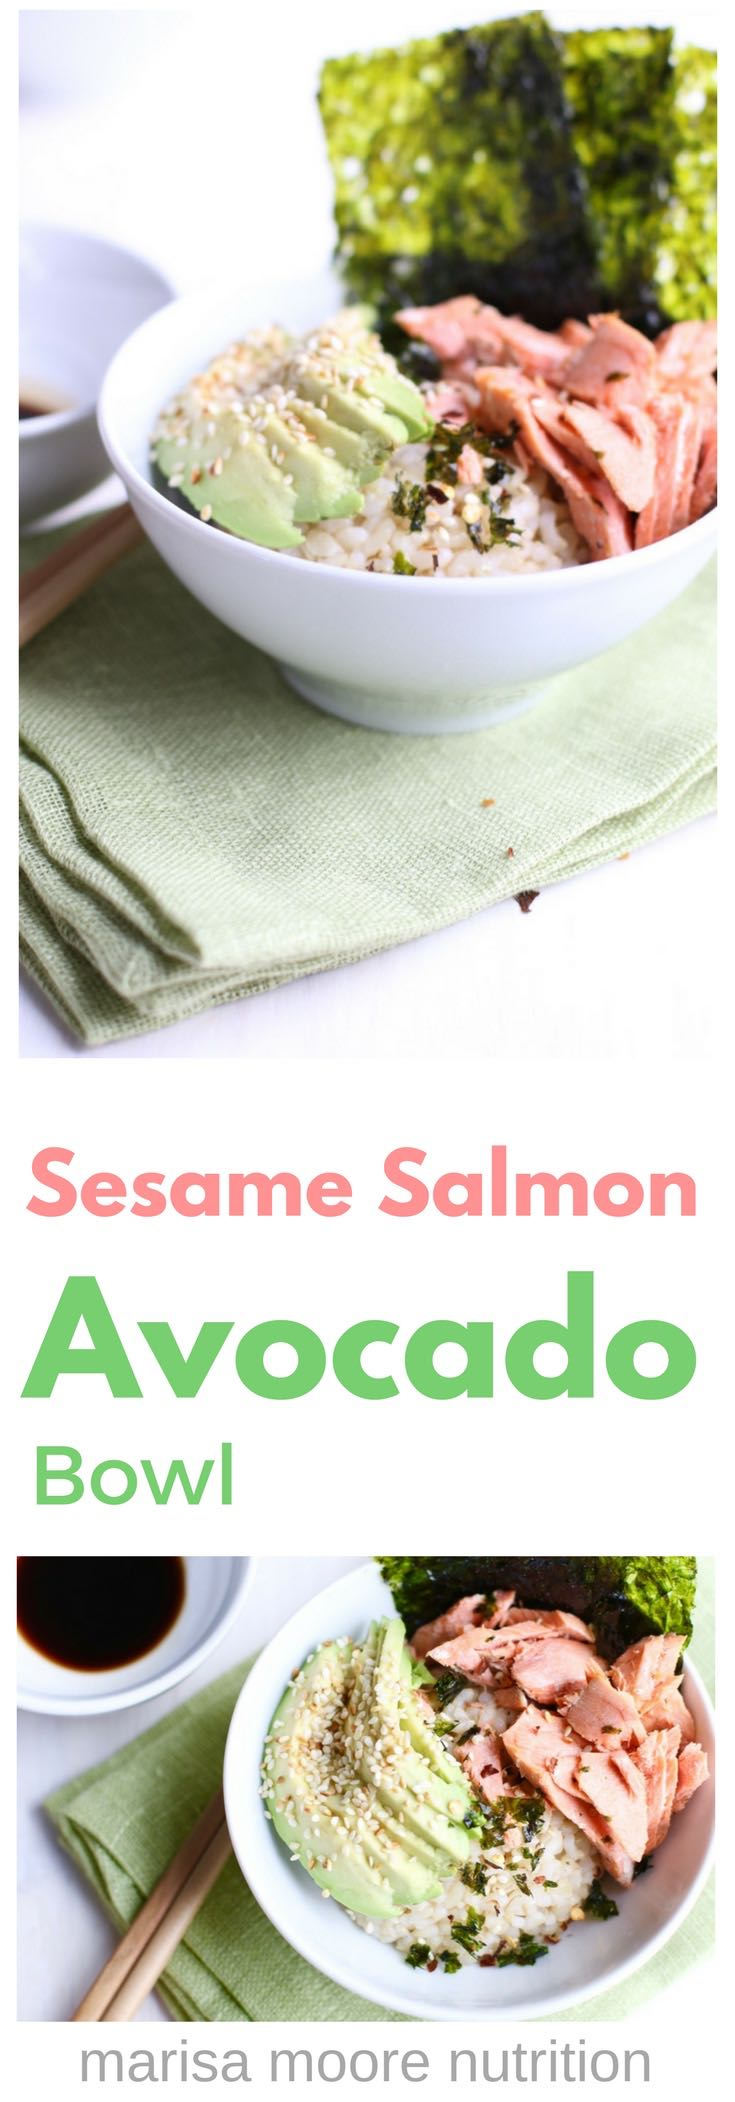 Sesame Salmon Avocado Bowl - It's salmon avocado sushi - unrolled!